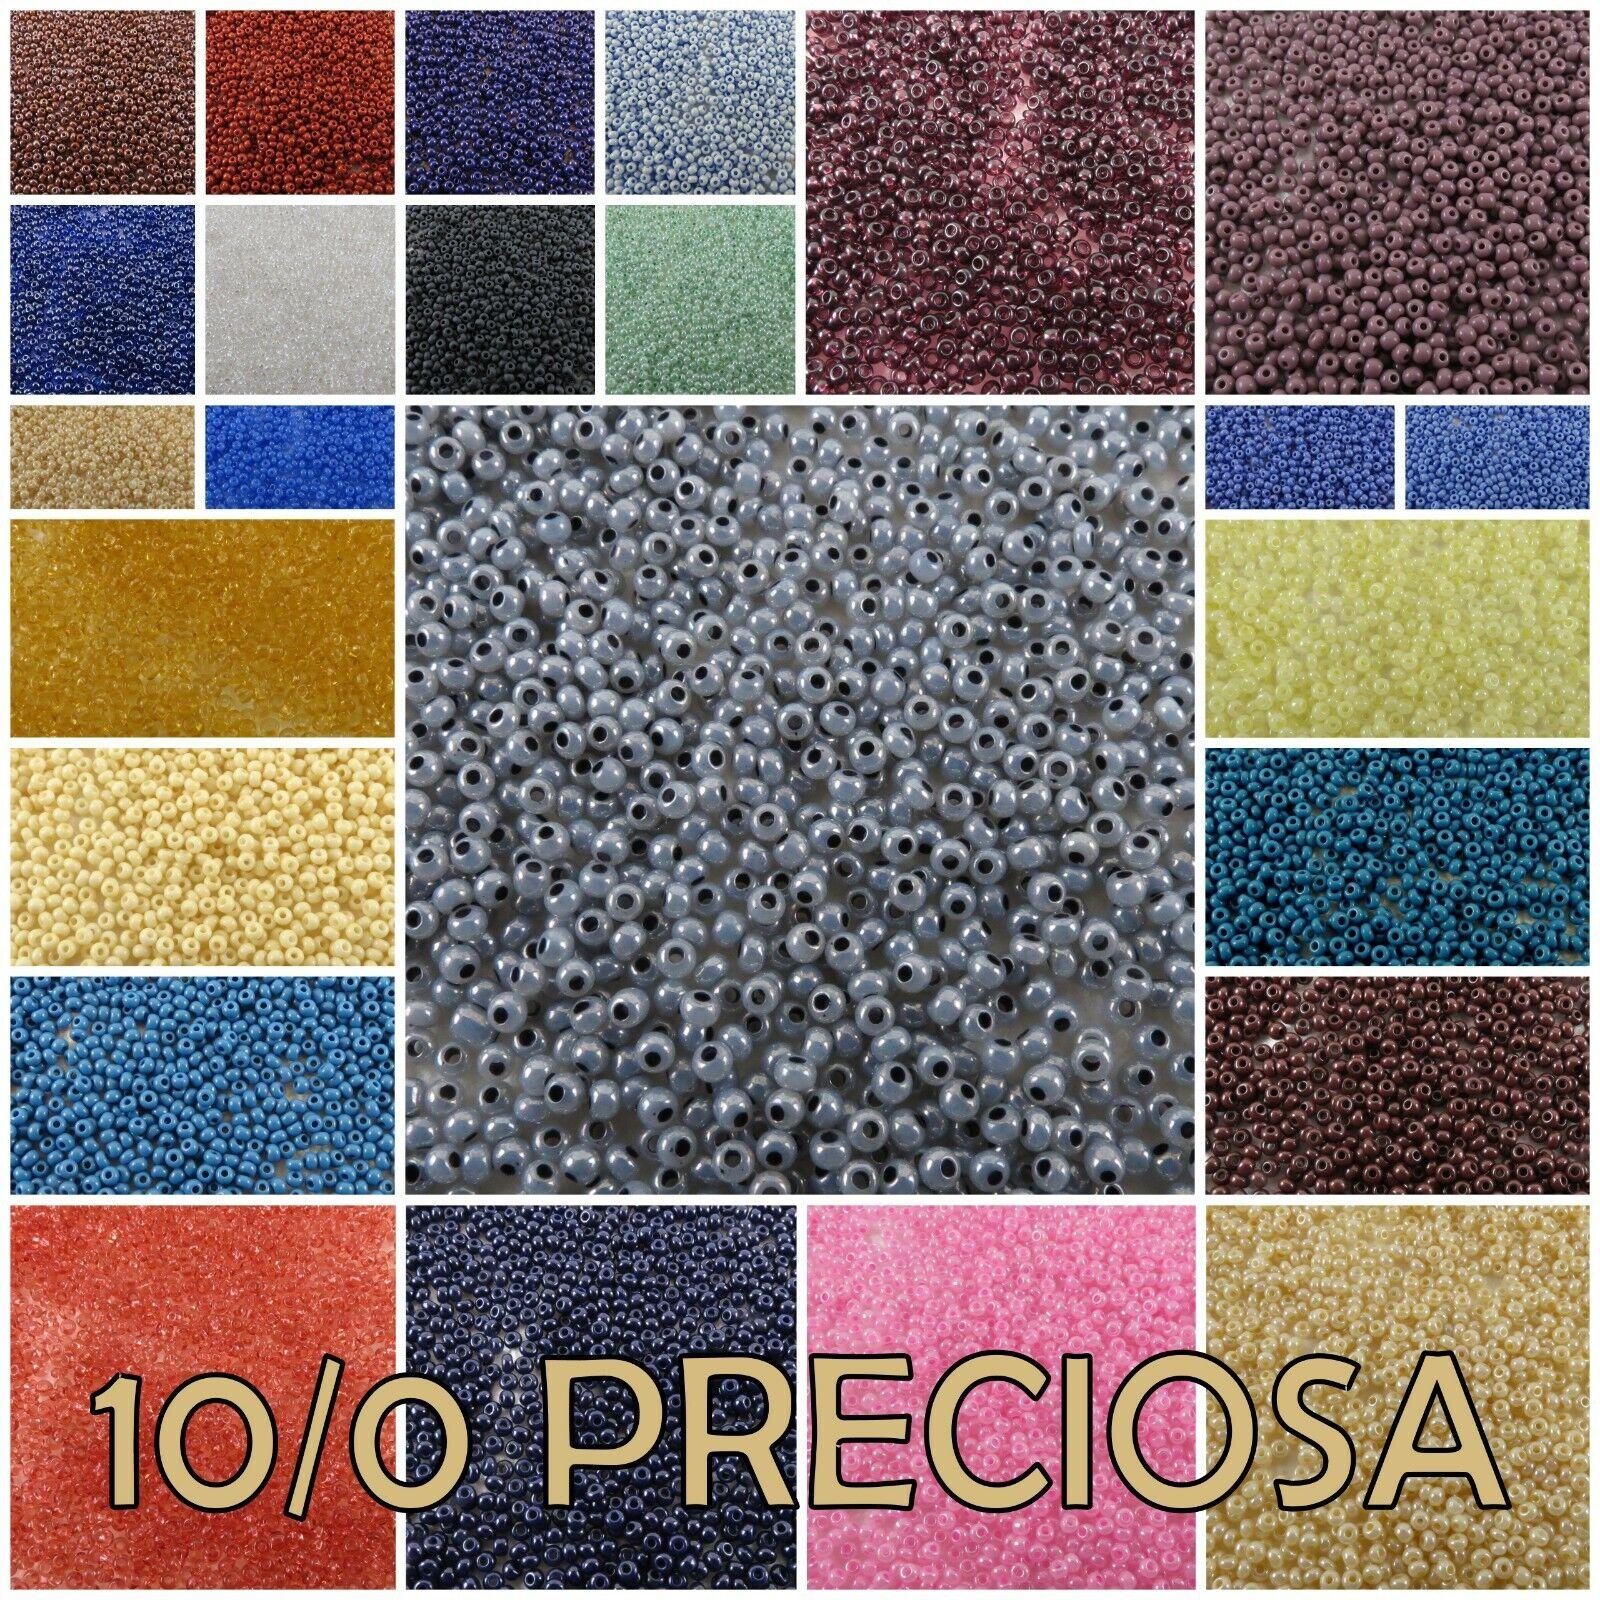 10/0 Preciosa Czech Round Seed Beads  06012-48102